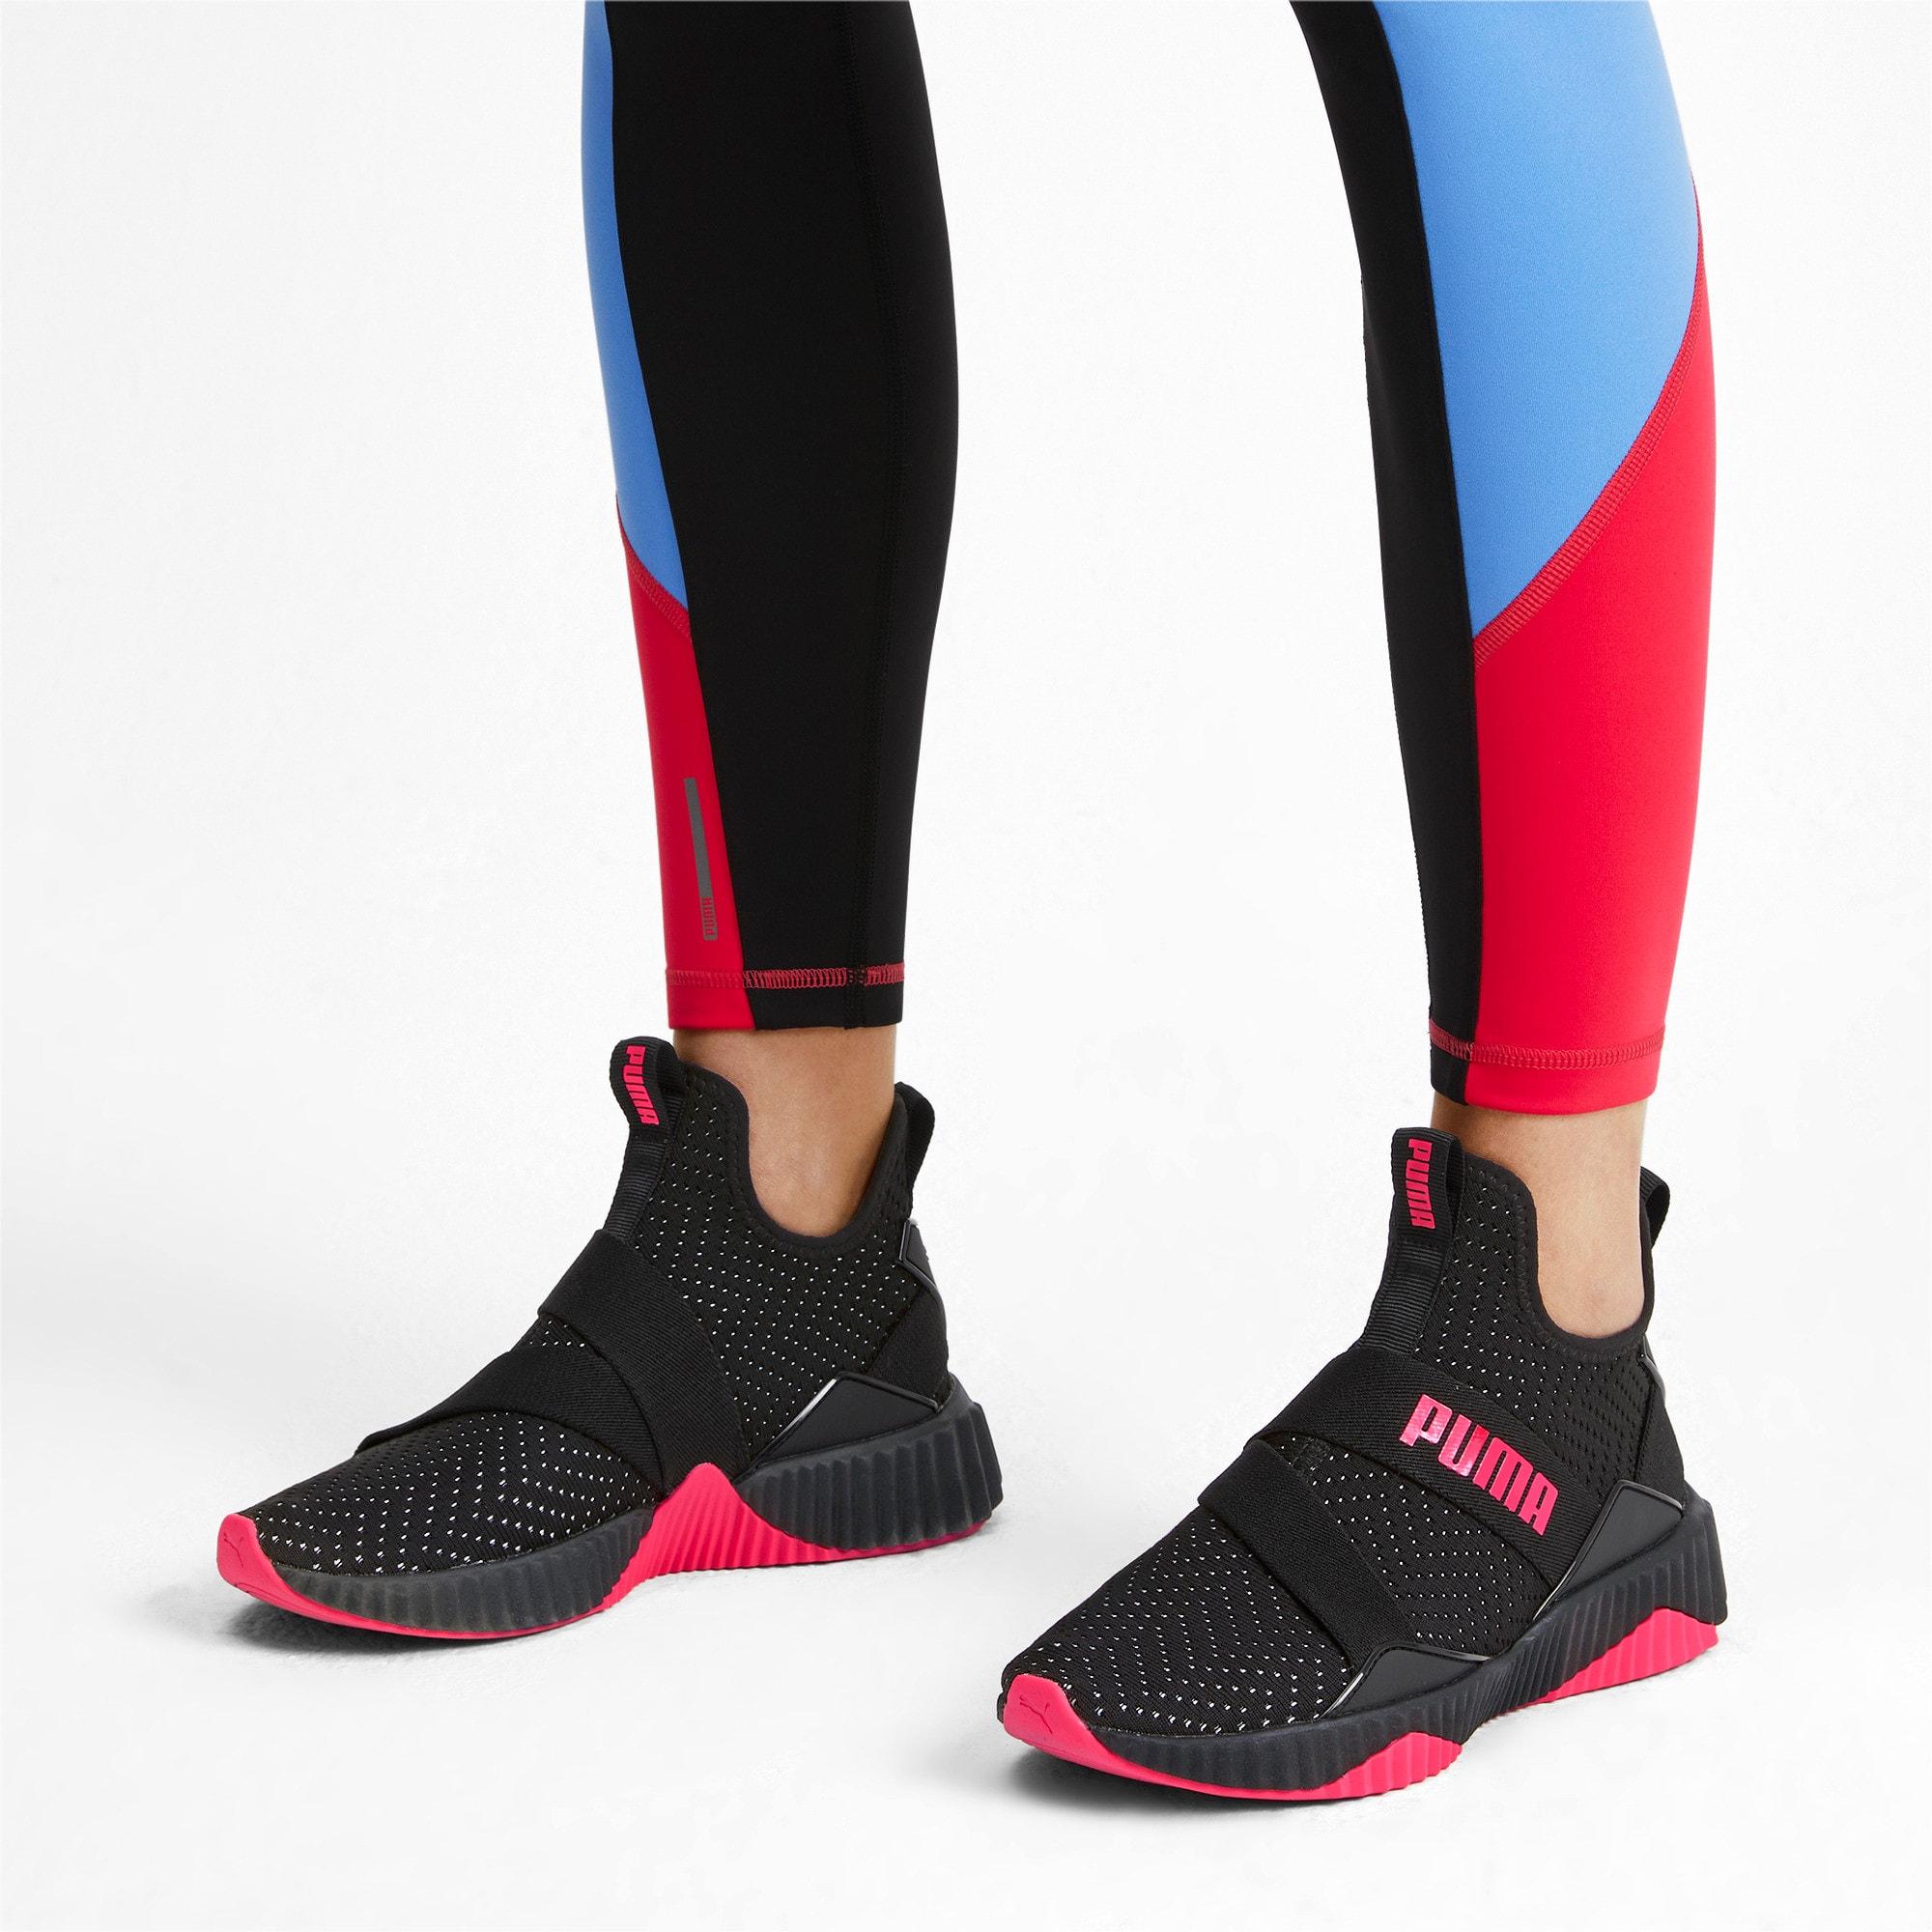 Thumbnail 2 of Defy Mid Core Women's Training Shoes, Puma Black-Pink Alert, medium